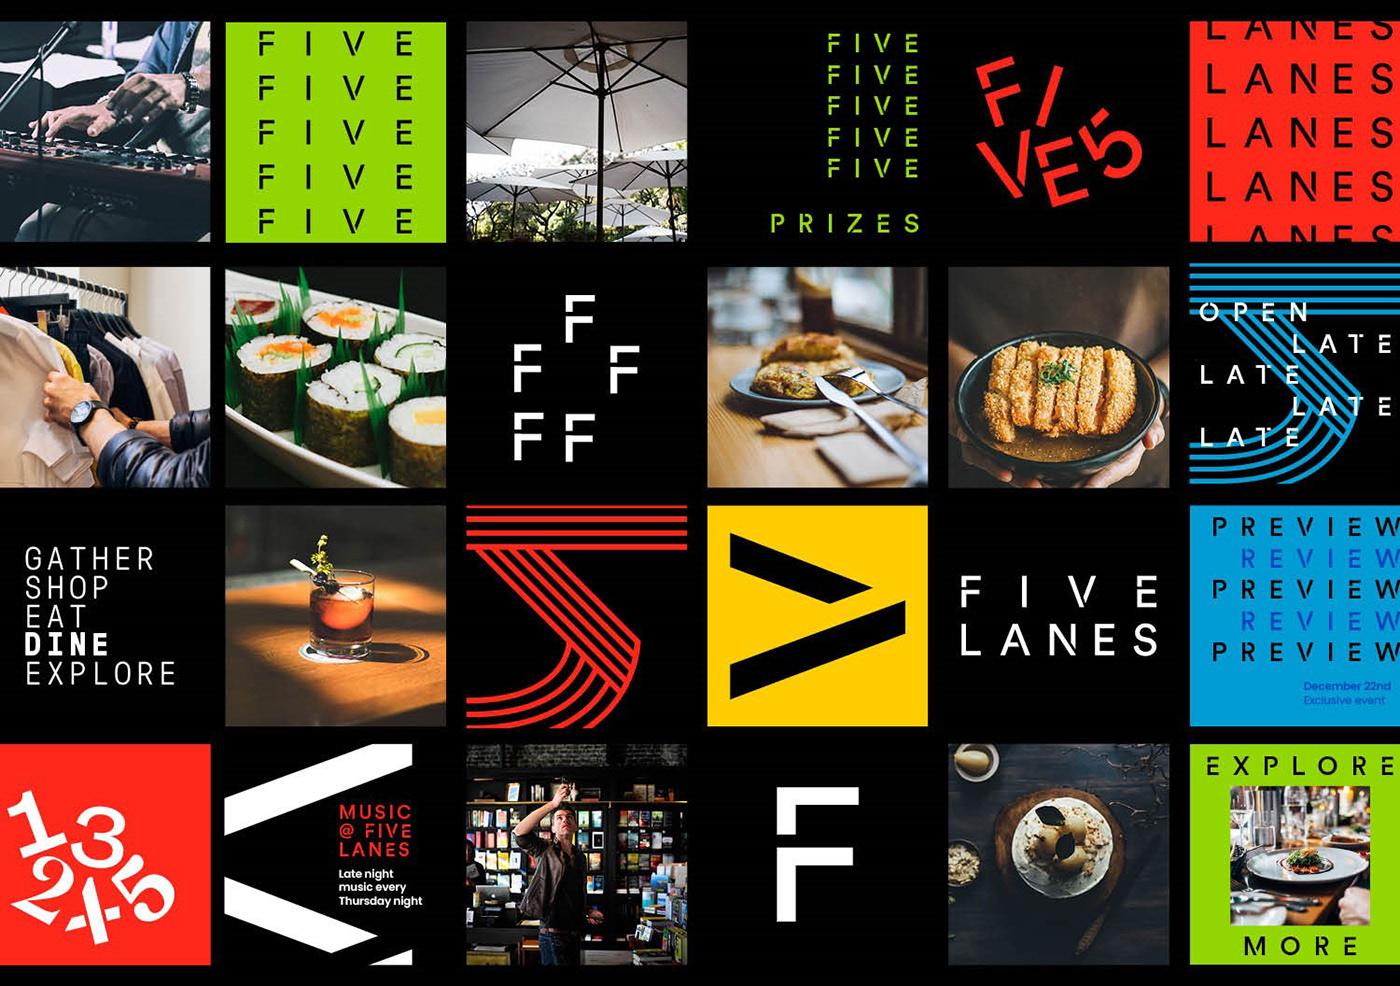 bold colors brand identity branding  graphic design  logo Signage Typeface typography   visual identity wayfinding